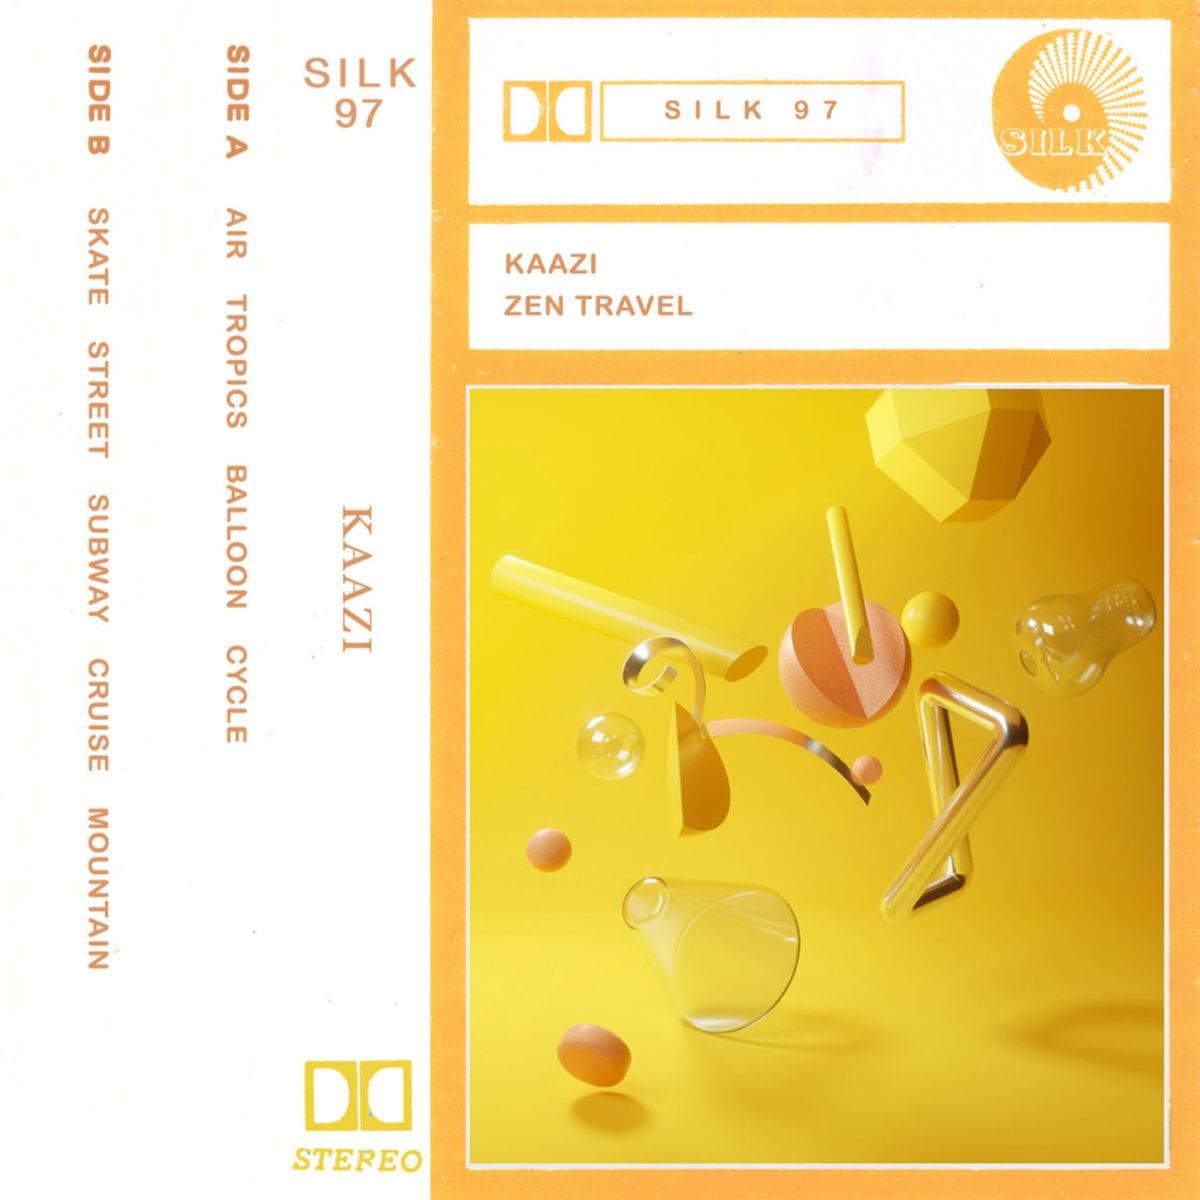 silk097-artweb